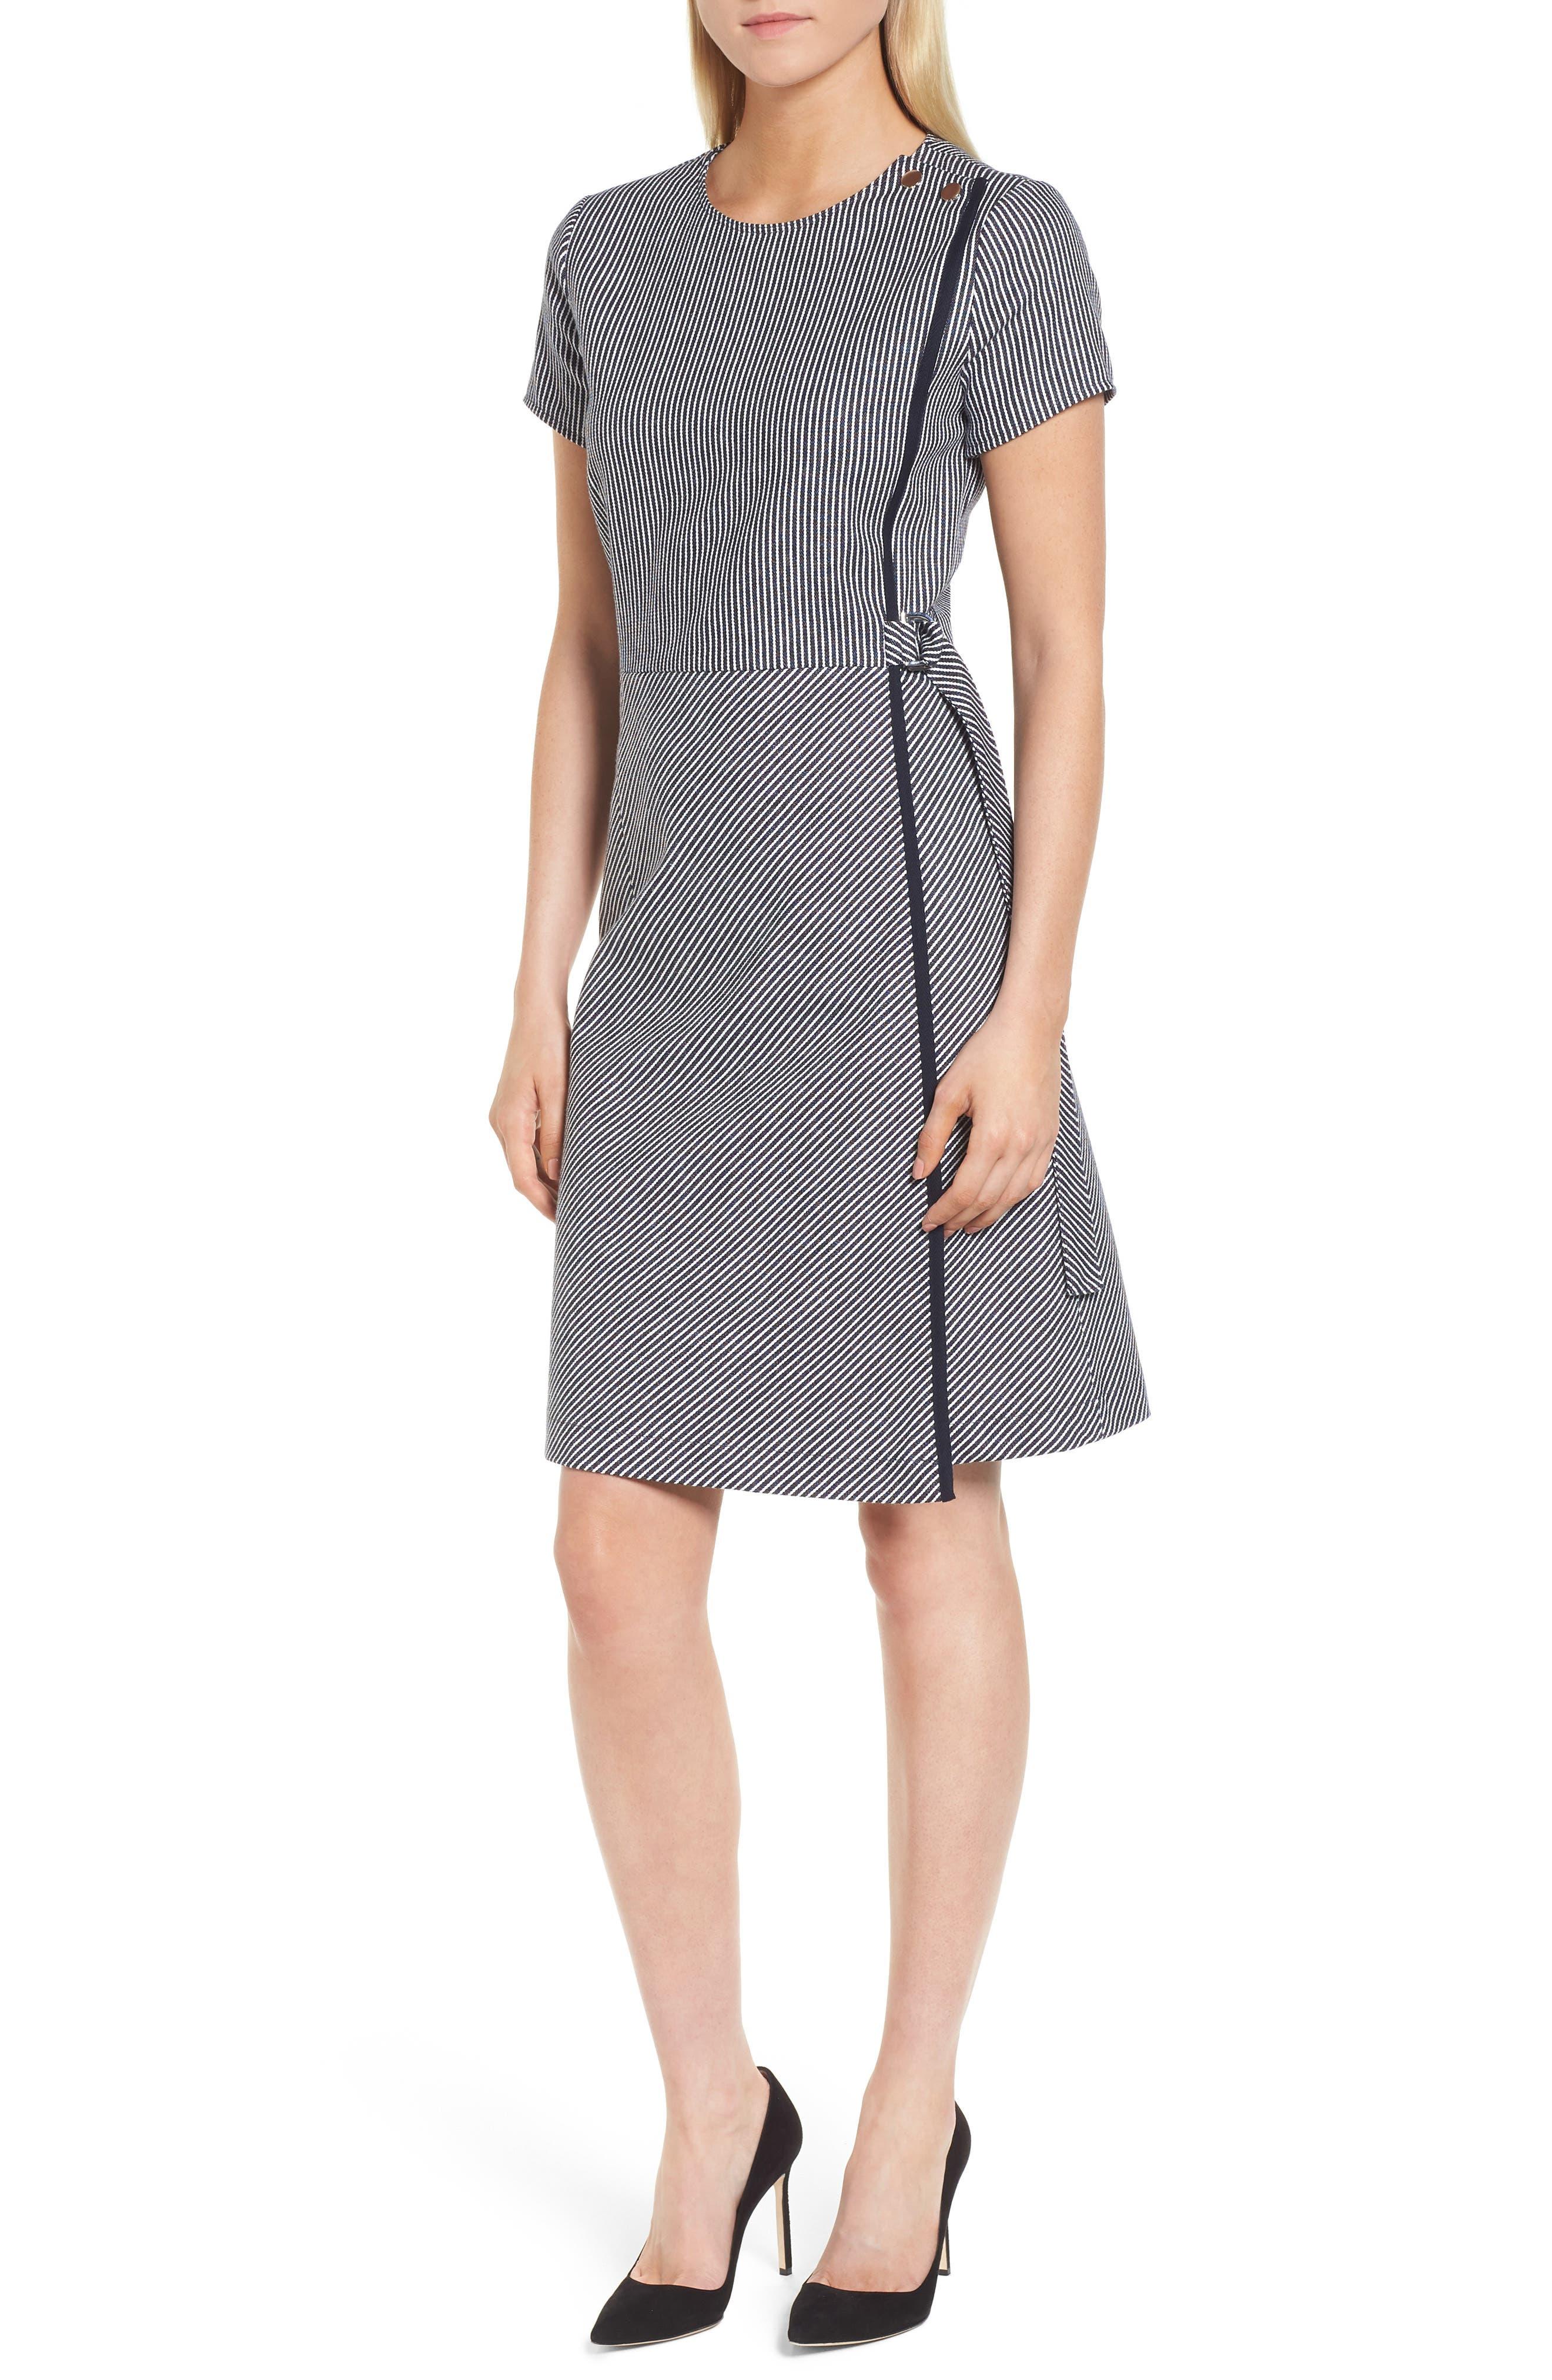 Hugo Boss Hadiana Dress,                         Main,                         color, 461